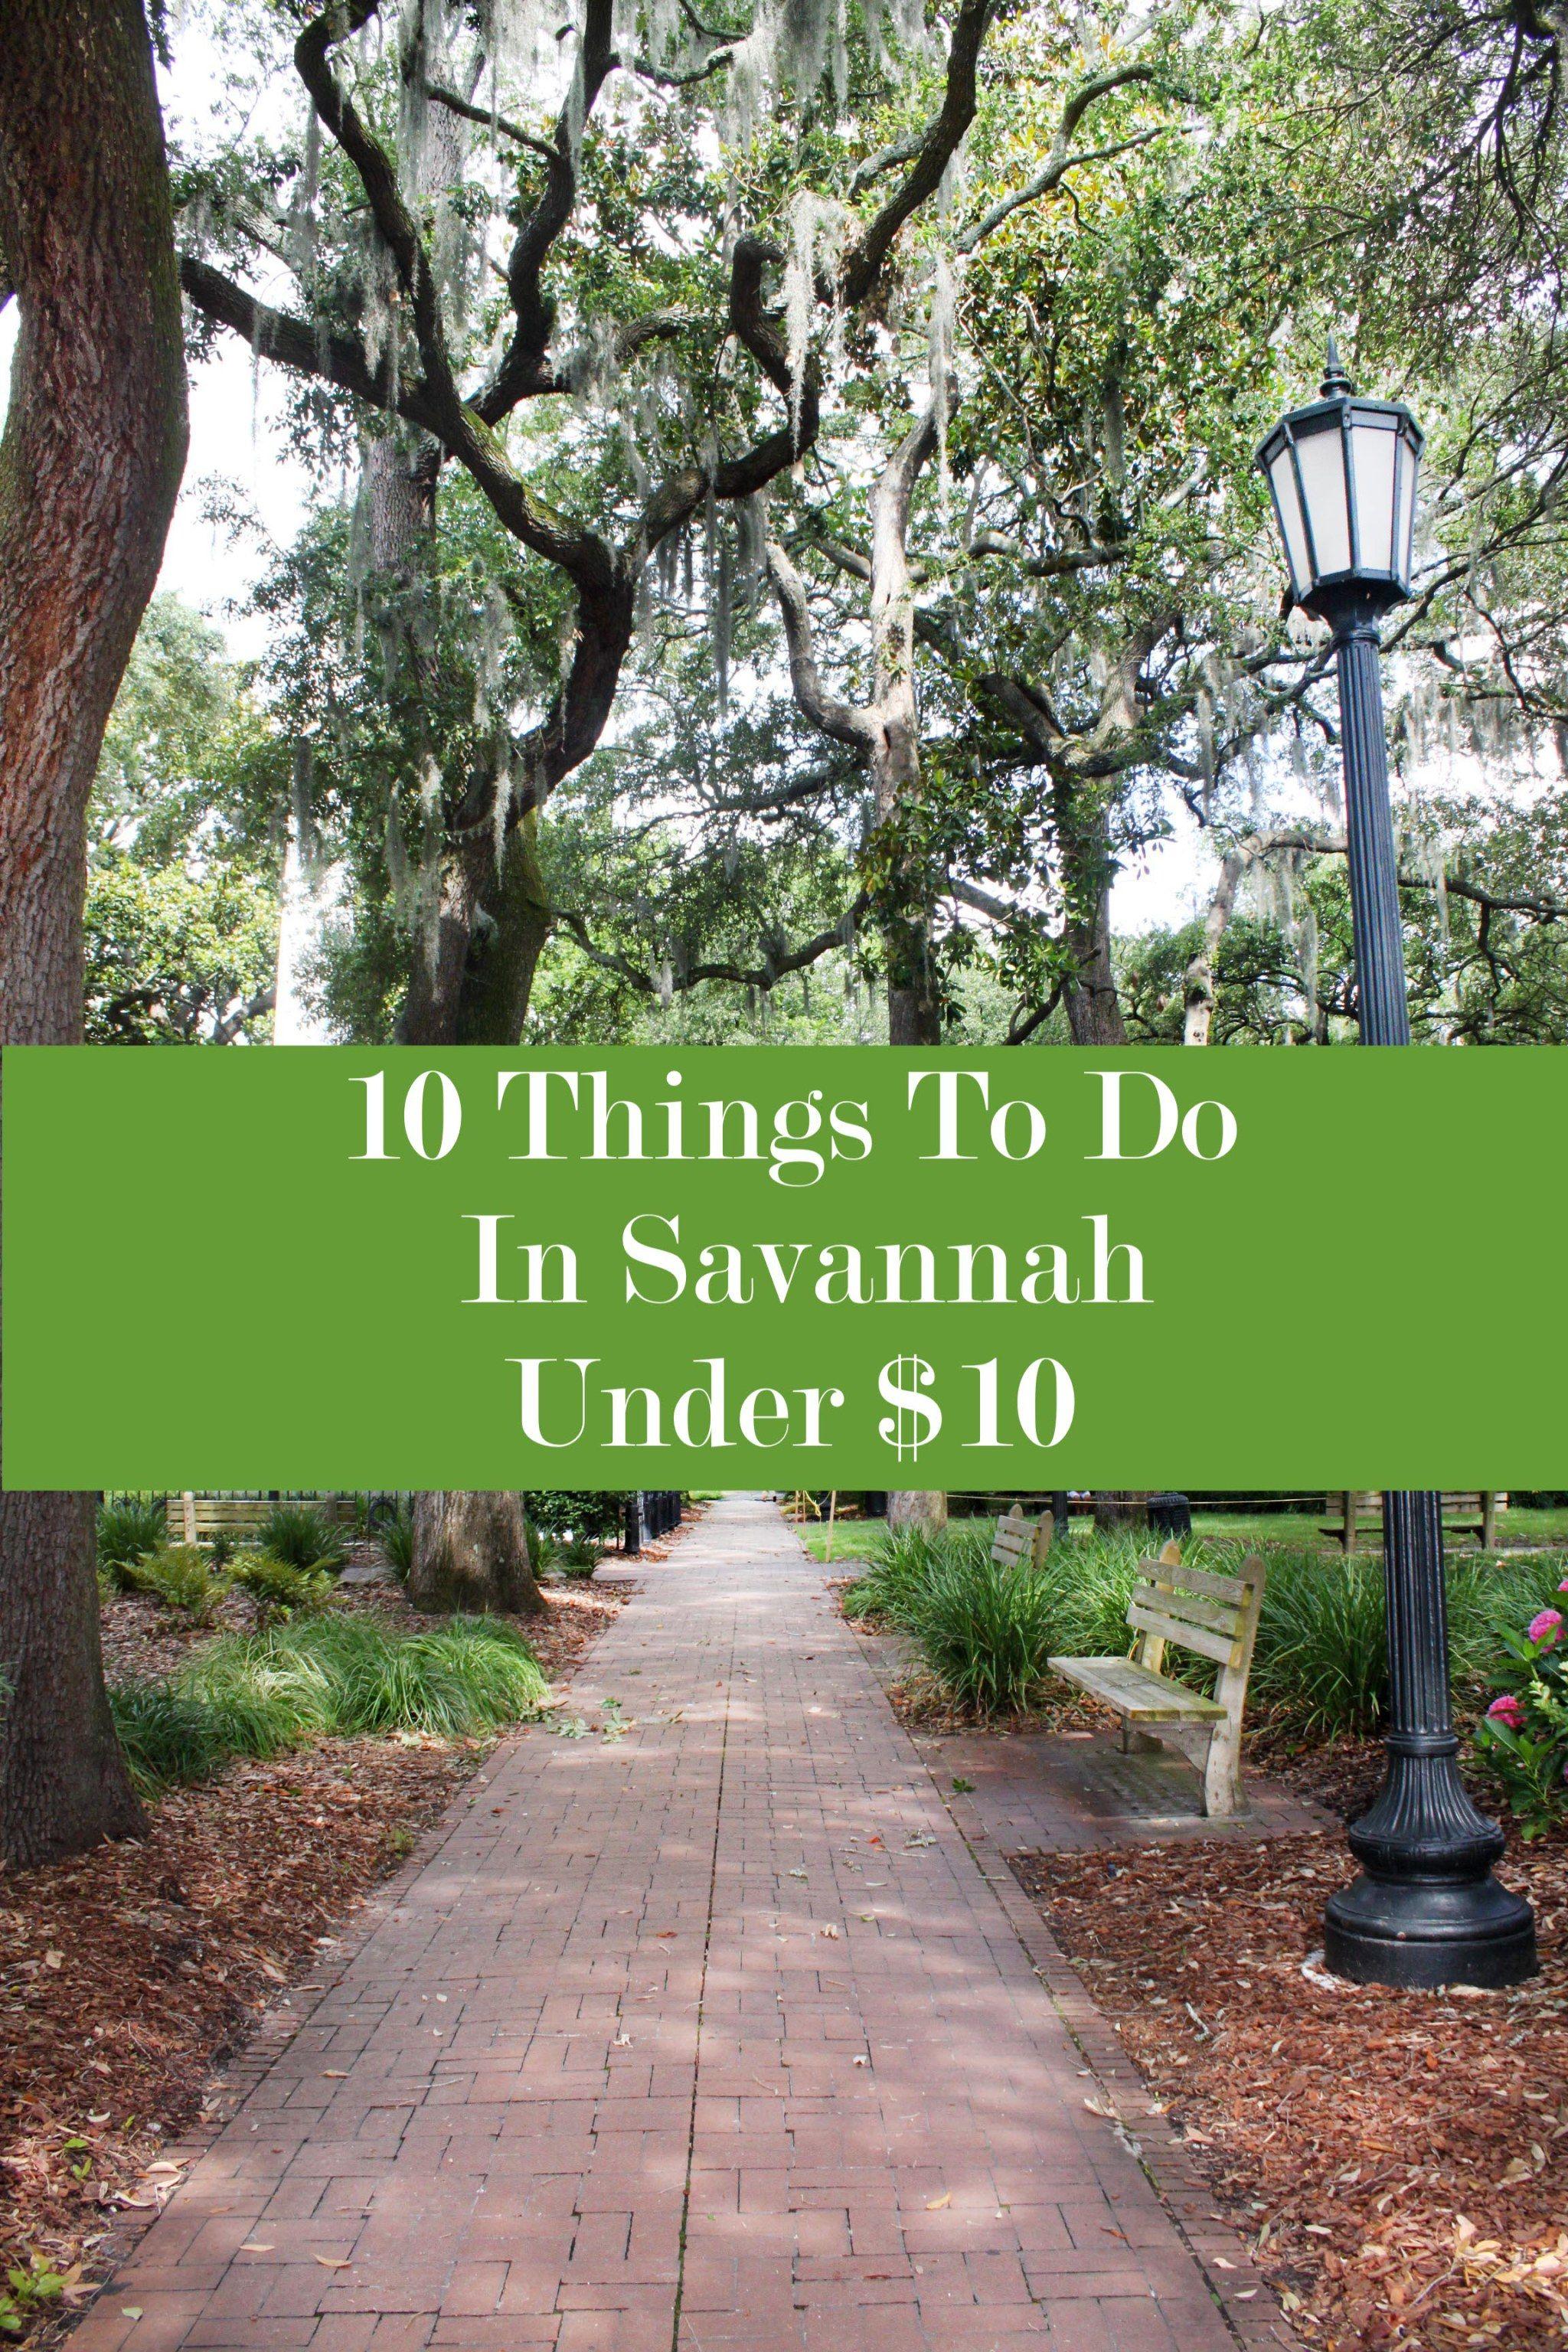 15 Things To Do In Savannah Georgia Savannah Chat Travel Savannah Georgia Vacation